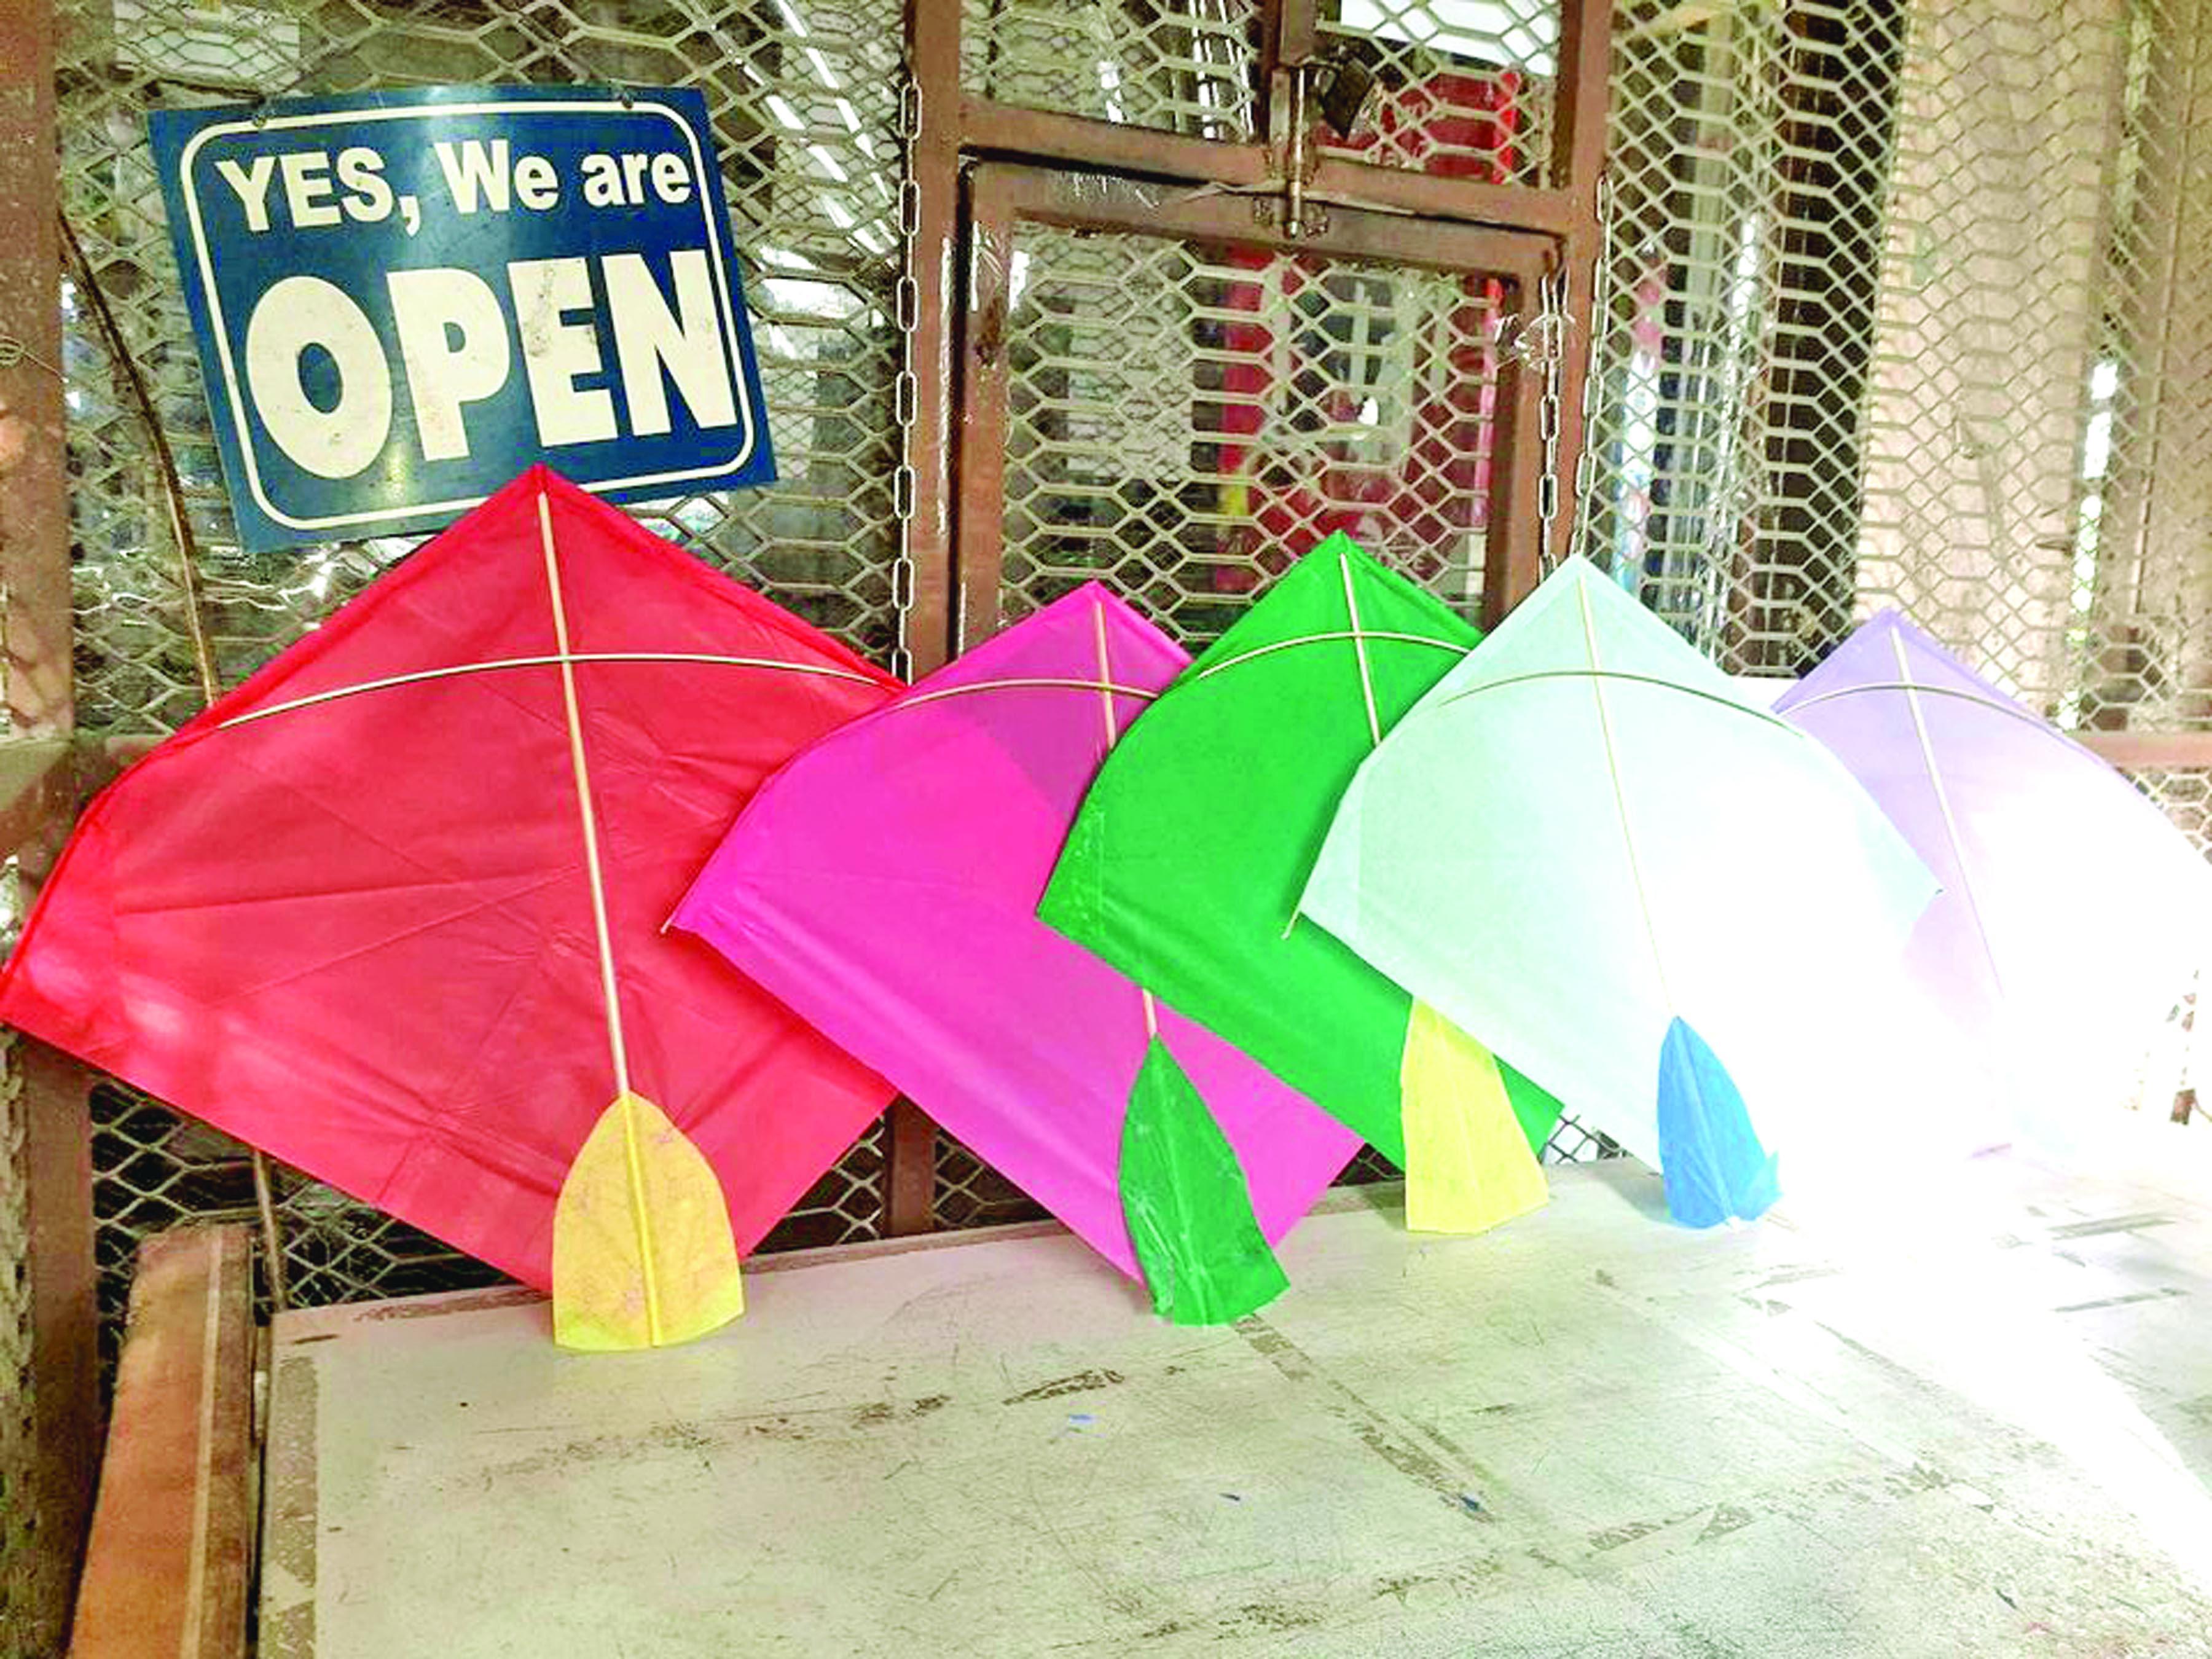 Ready-made kites on sale.